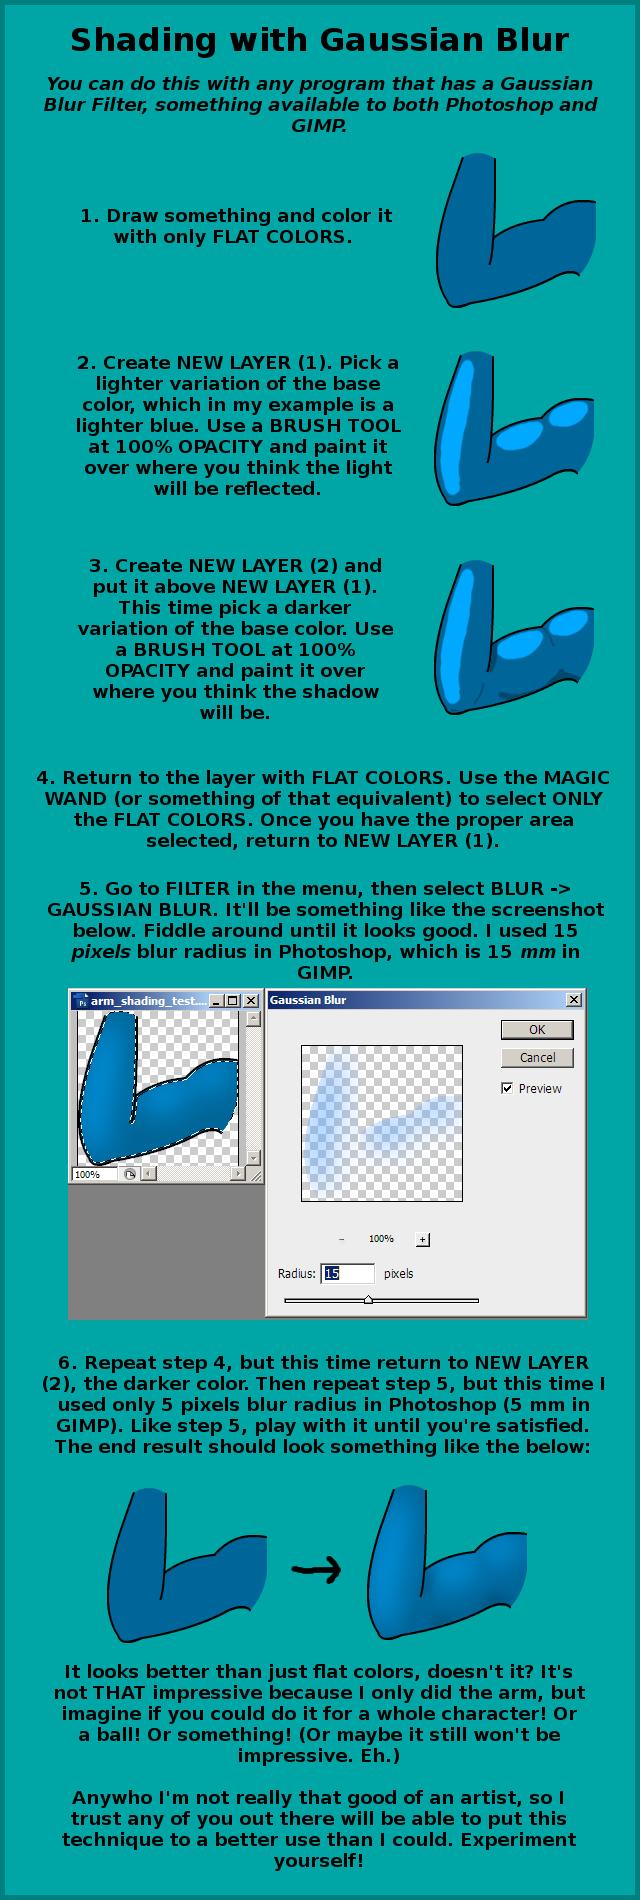 Gaussian Blur Coloring/Shading Tutorial by Aquablast-Fon on DeviantArt